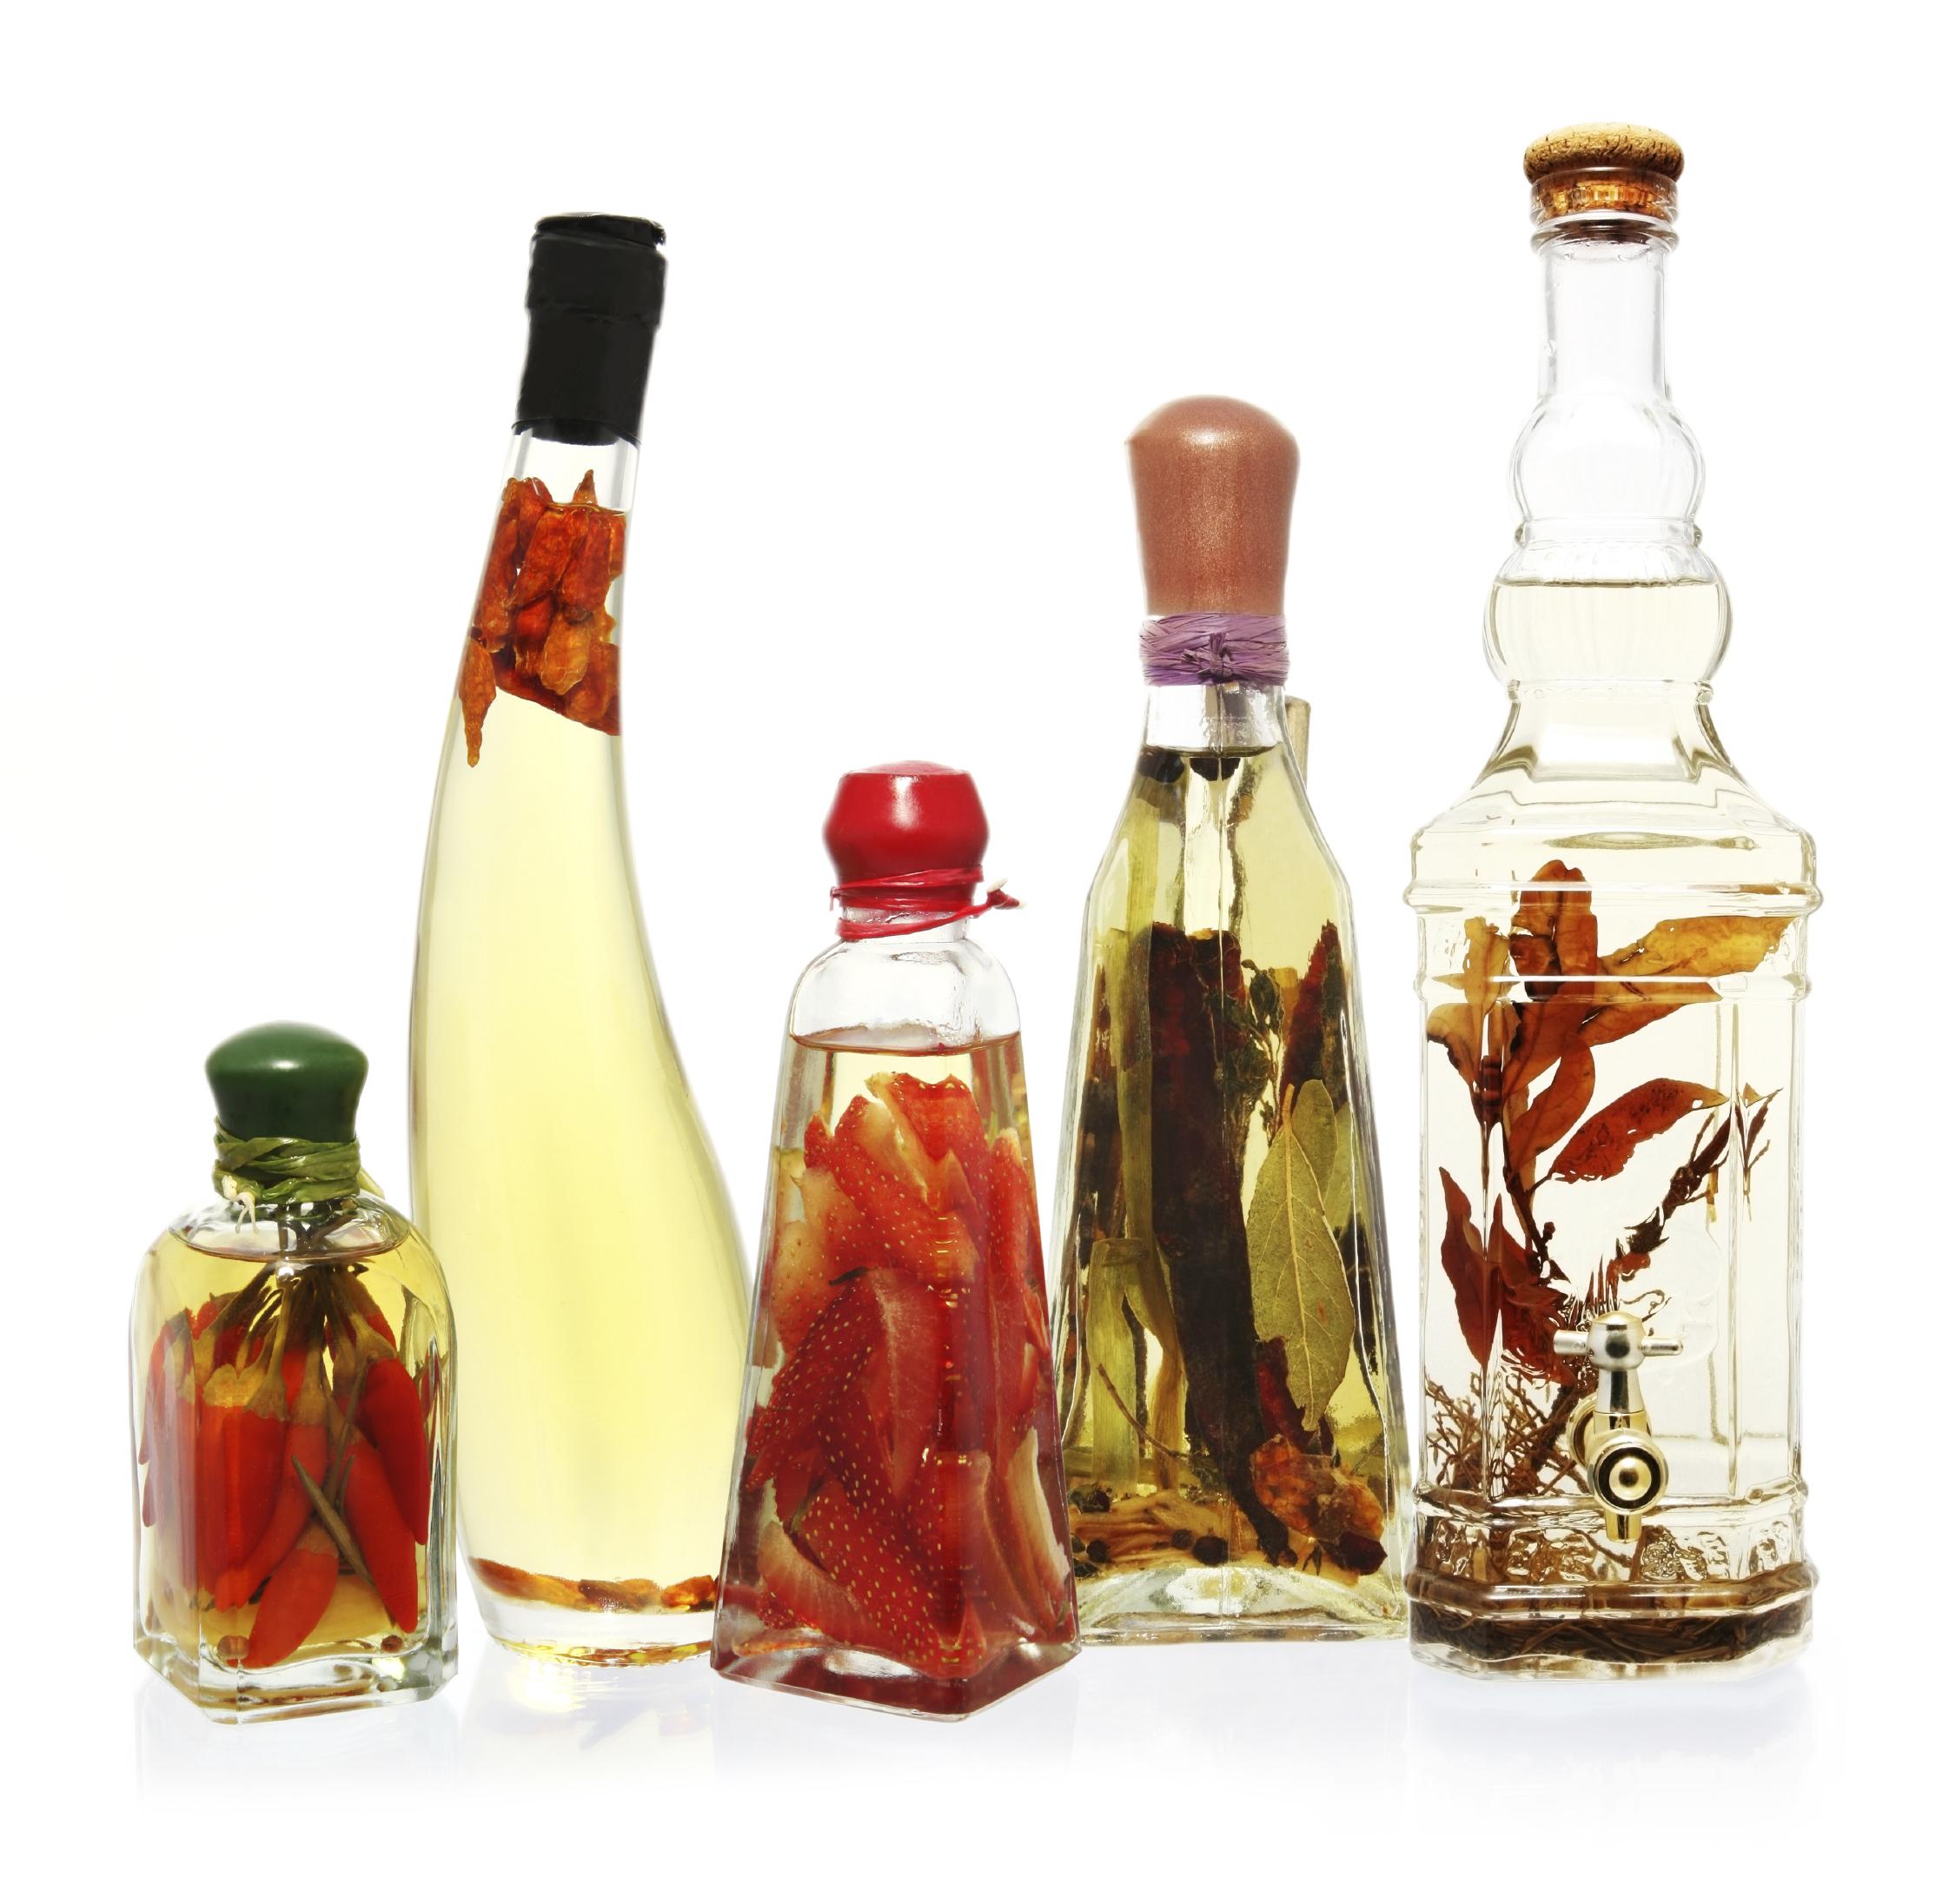 Manualidades usando envases de vidrio friends of - Manualidades con botellas de cristal ...